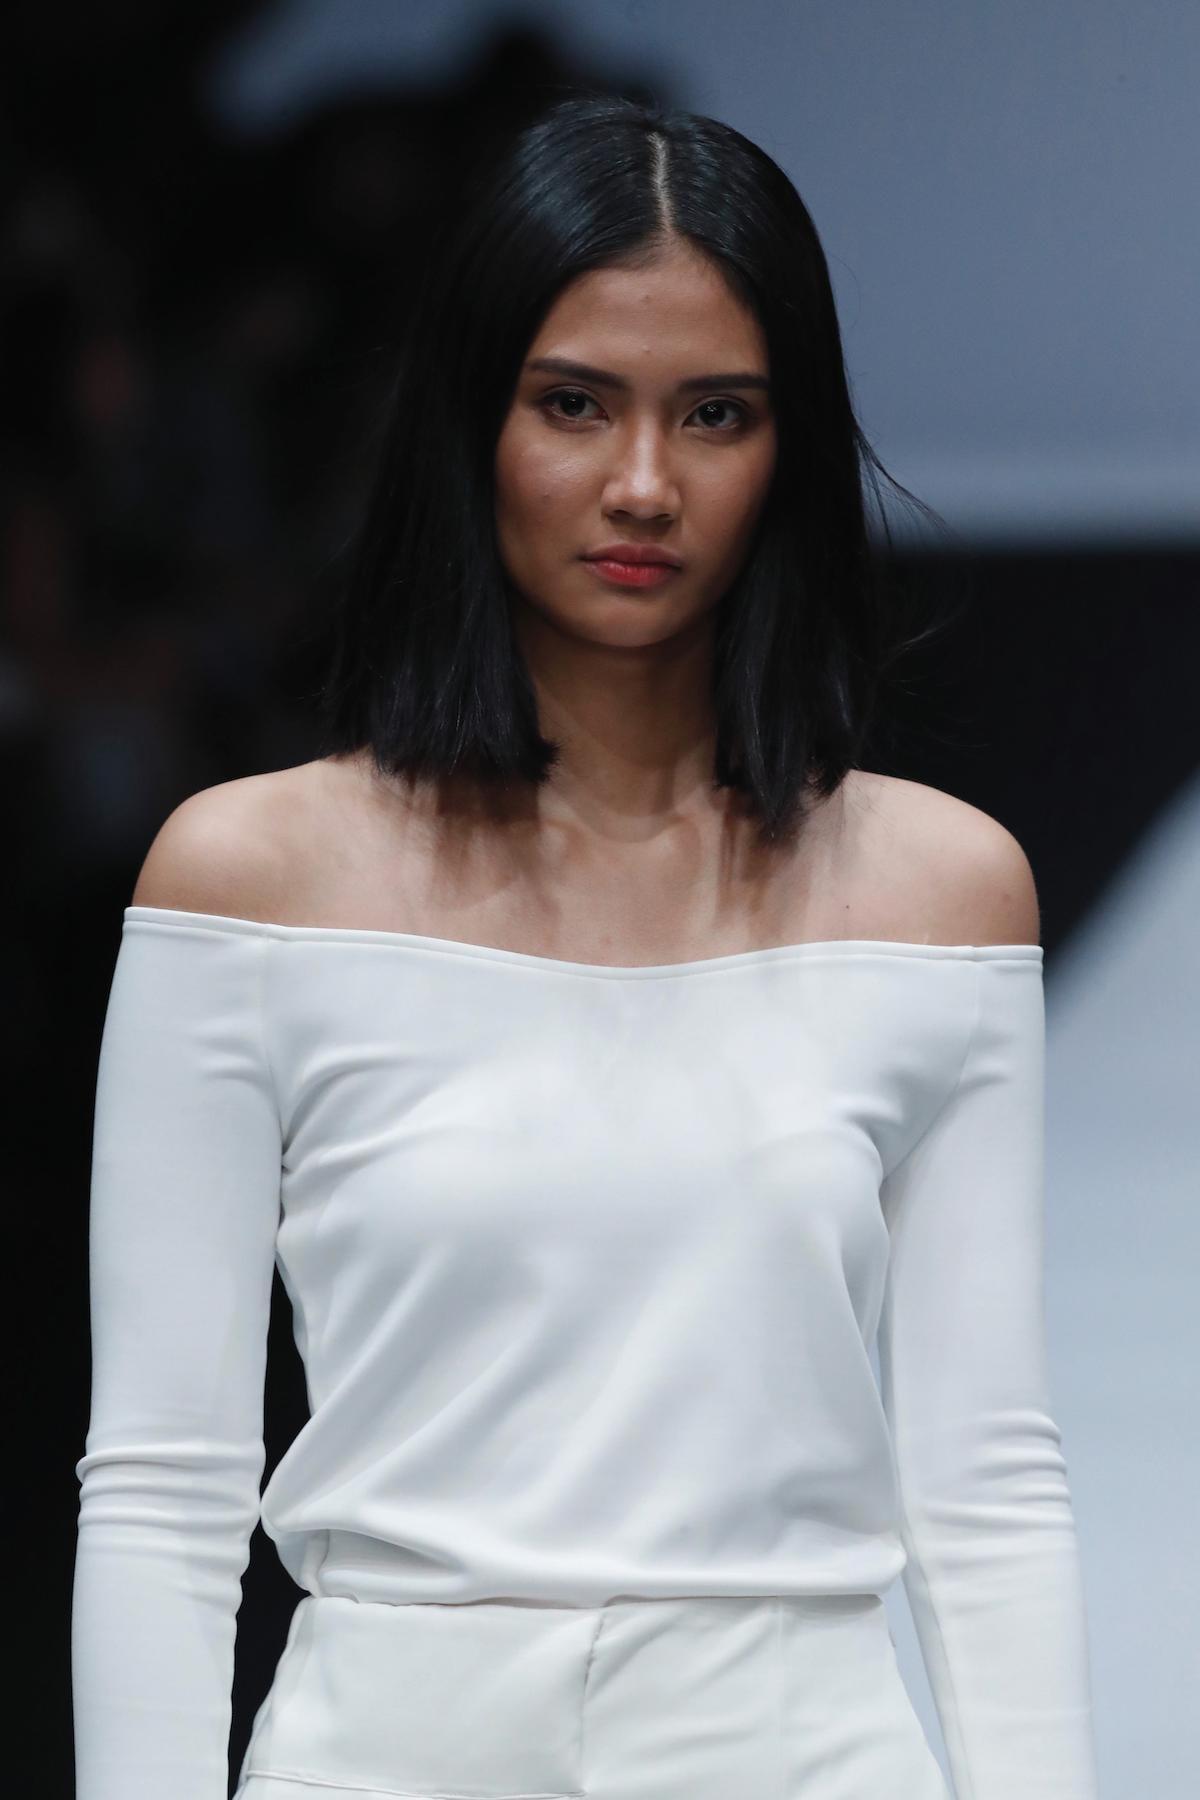 89+ Model Model Rambut Pendek Hasil Smoothing Paling Bagus